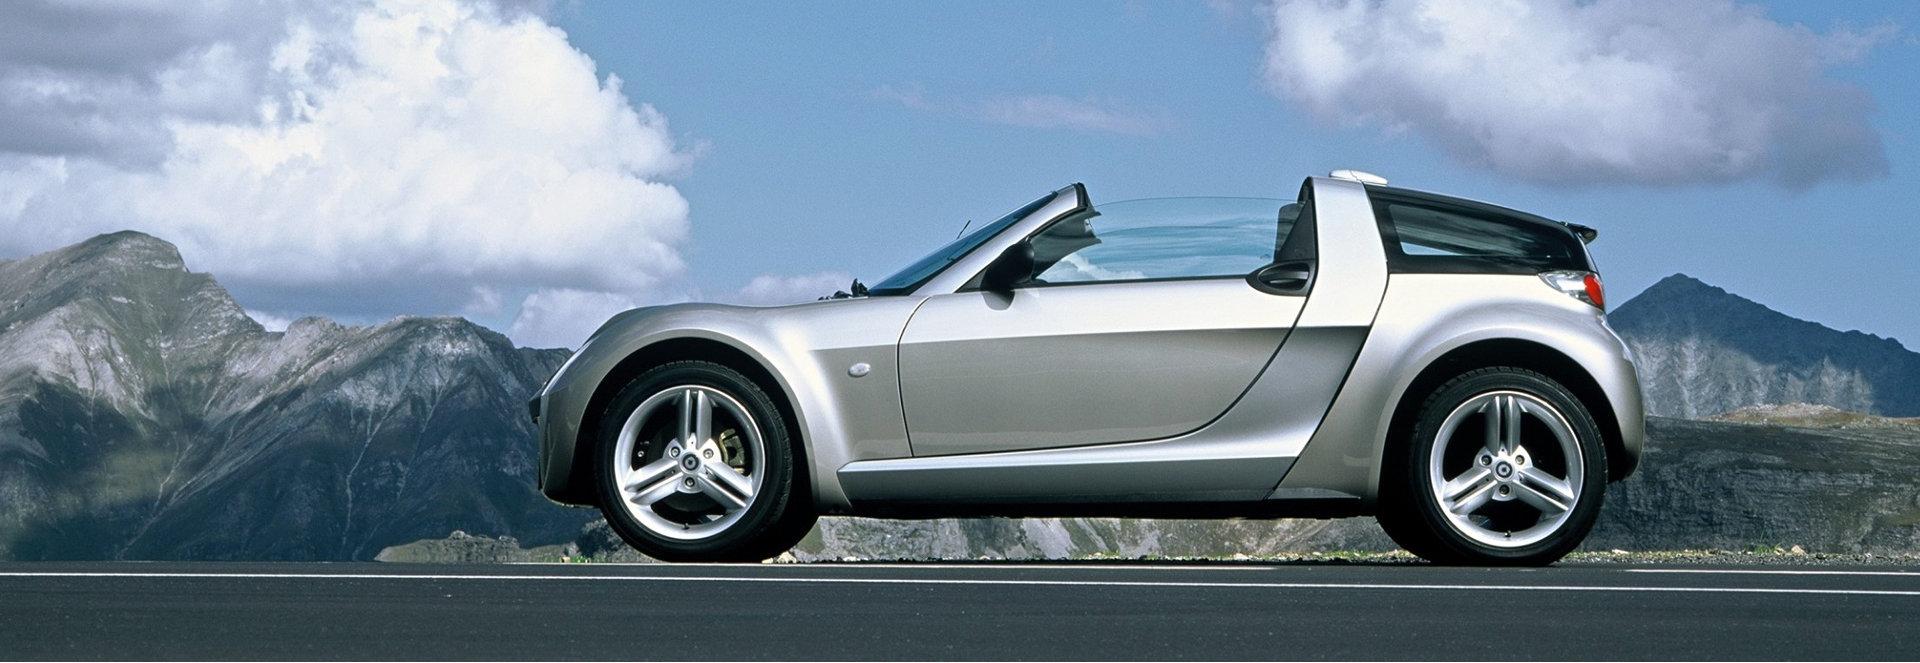 Coche del día: smart roadster coupé